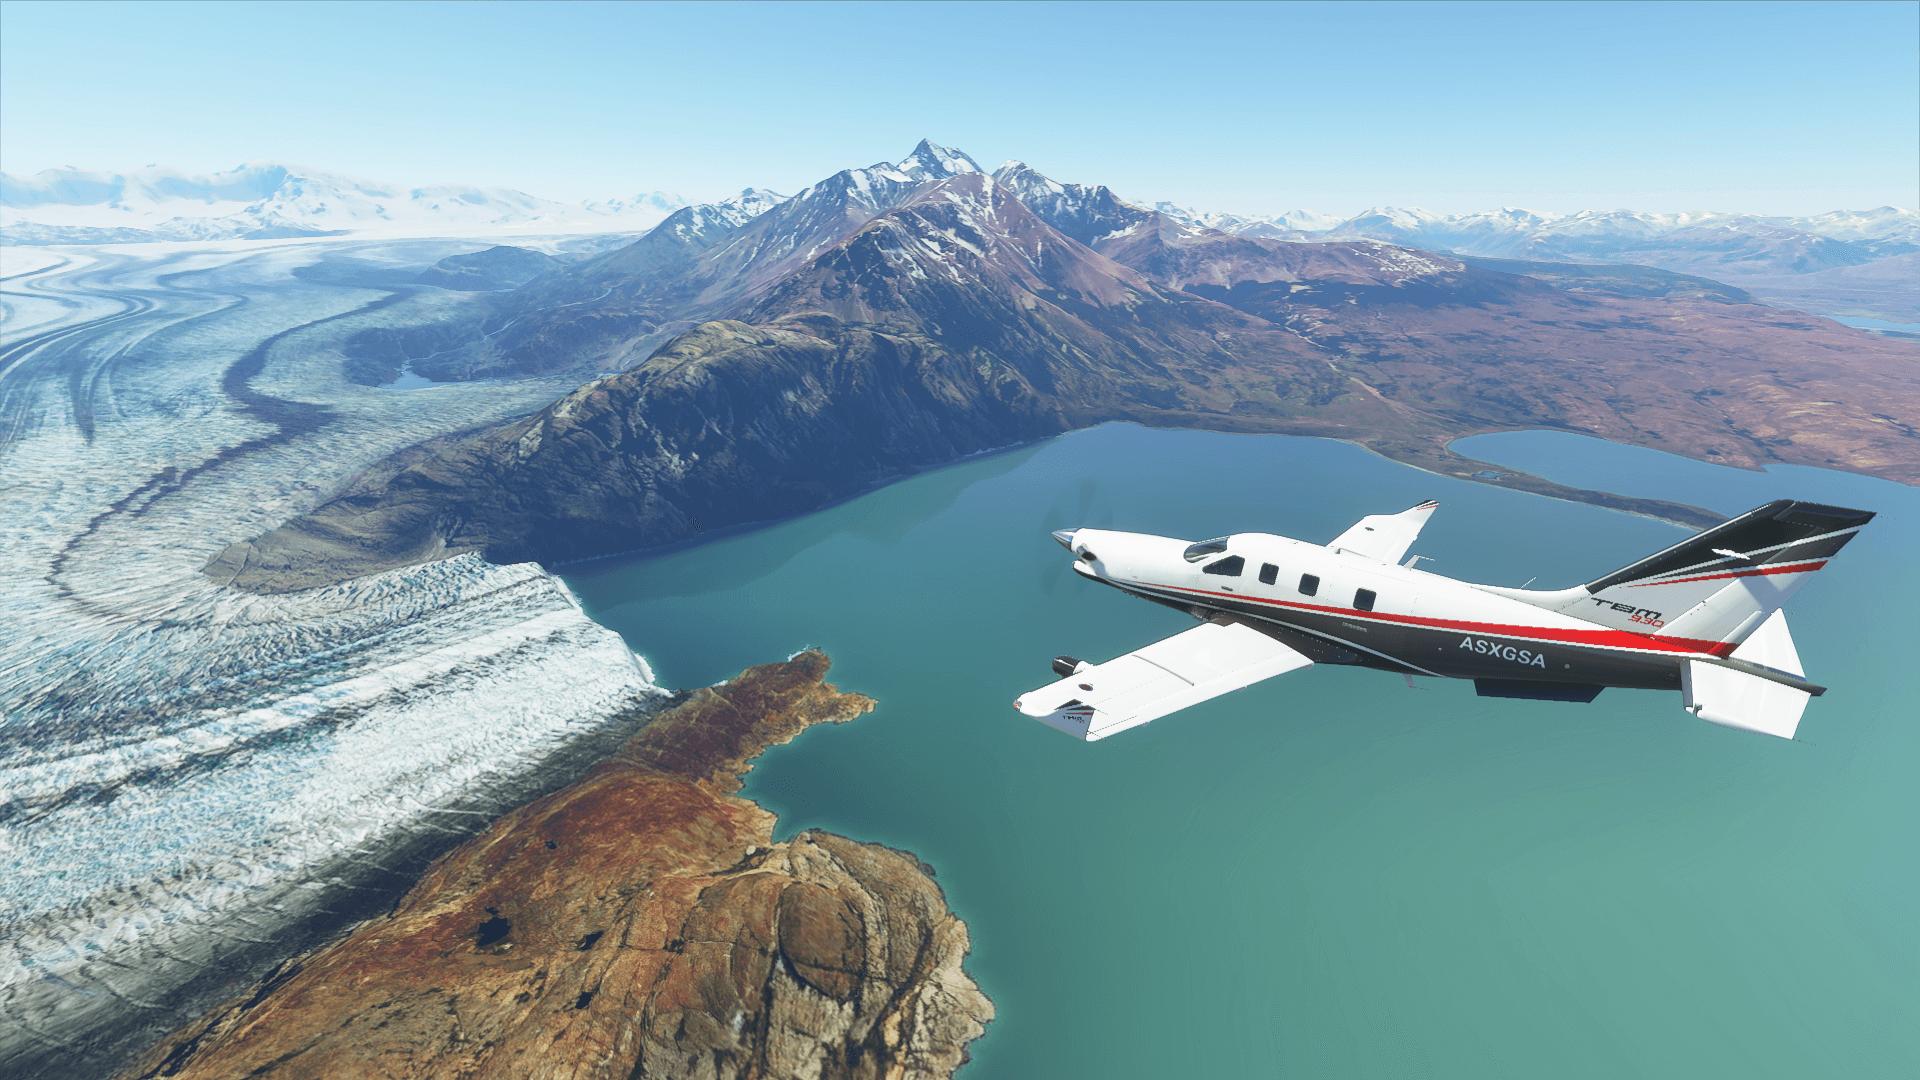 Microsoft Flight Simulator - Update #5 Released